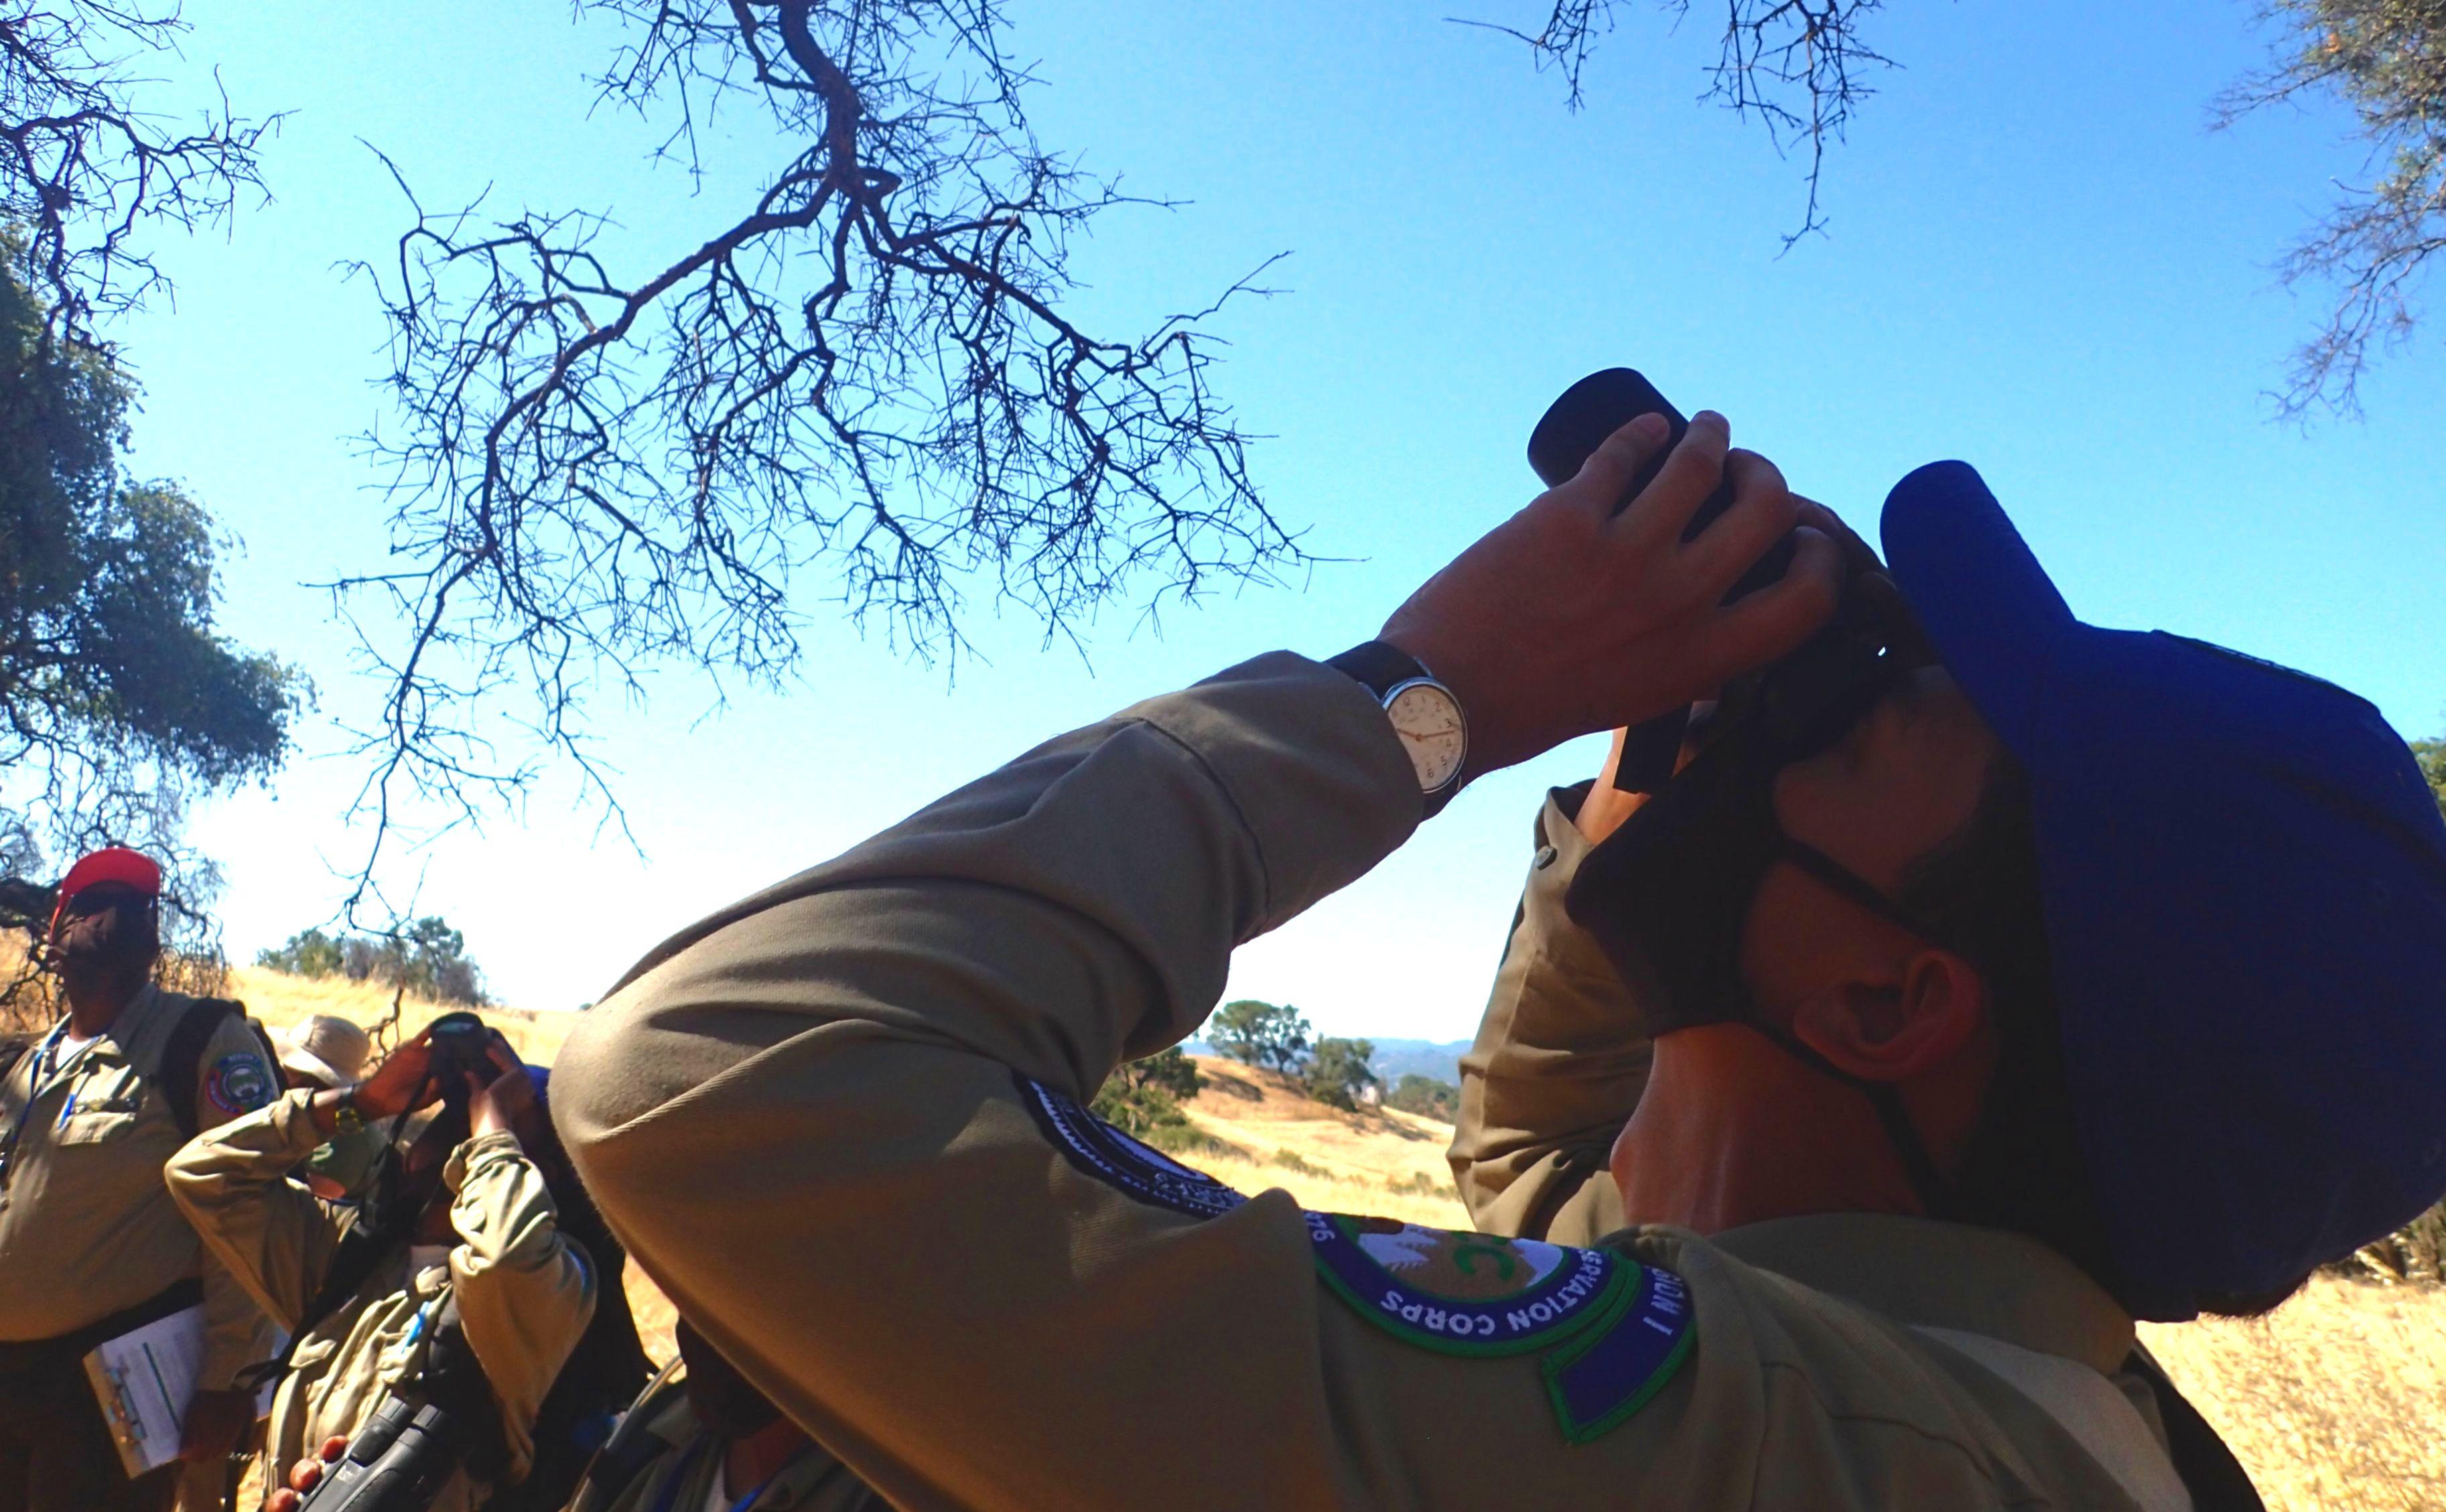 Ukiah Conservation Corp California Naturalisst look at a tree with binoculars